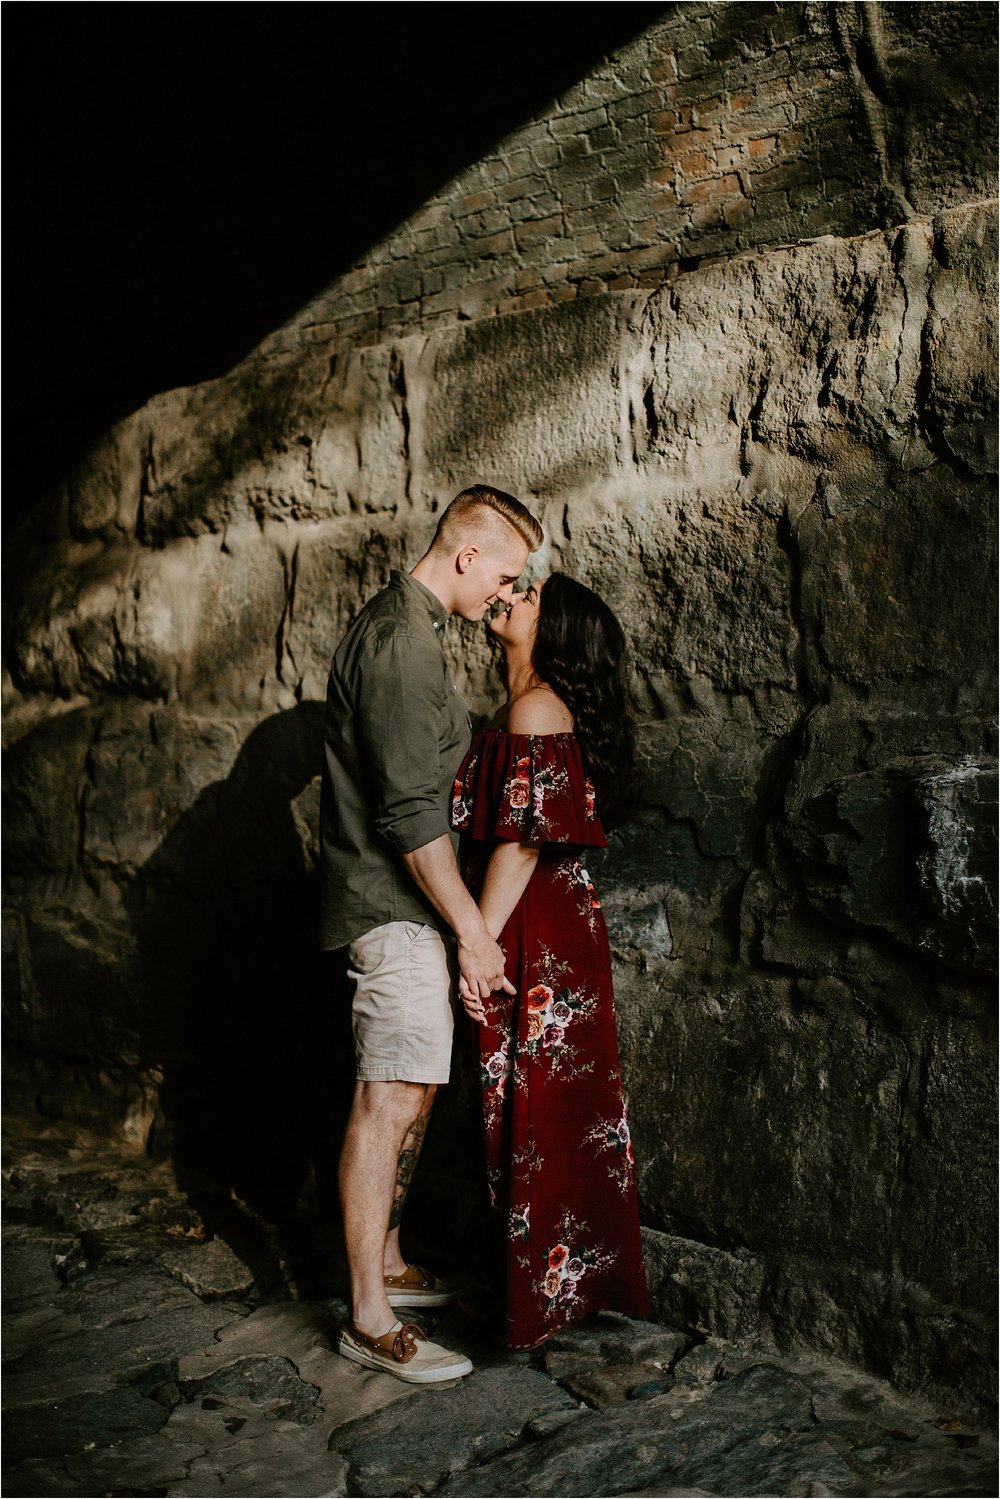 Sarah_Brookhart_Baltimore_Philly_Wedding_Photographer_0006-1.jpg